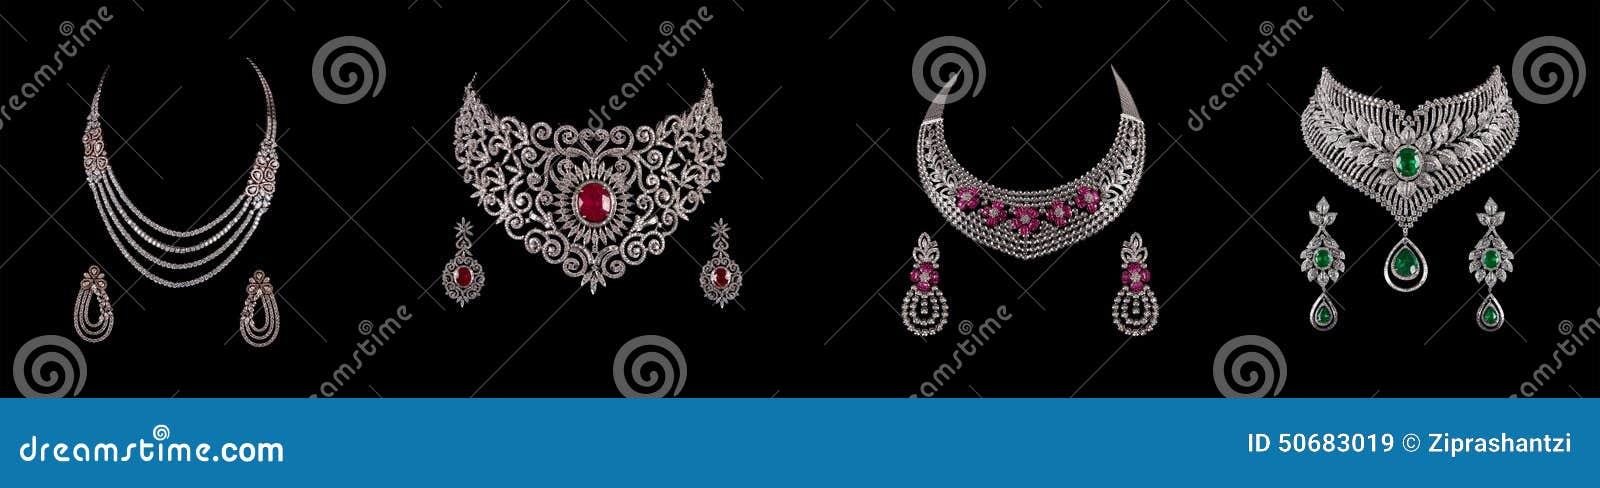 Download 钻石项链拼贴画与耳环的 库存图片. 图片 包括有 绿宝石, 耳朵, 绿色, 耳环, 闪闪发光, 消耗大, 白金 - 50683019